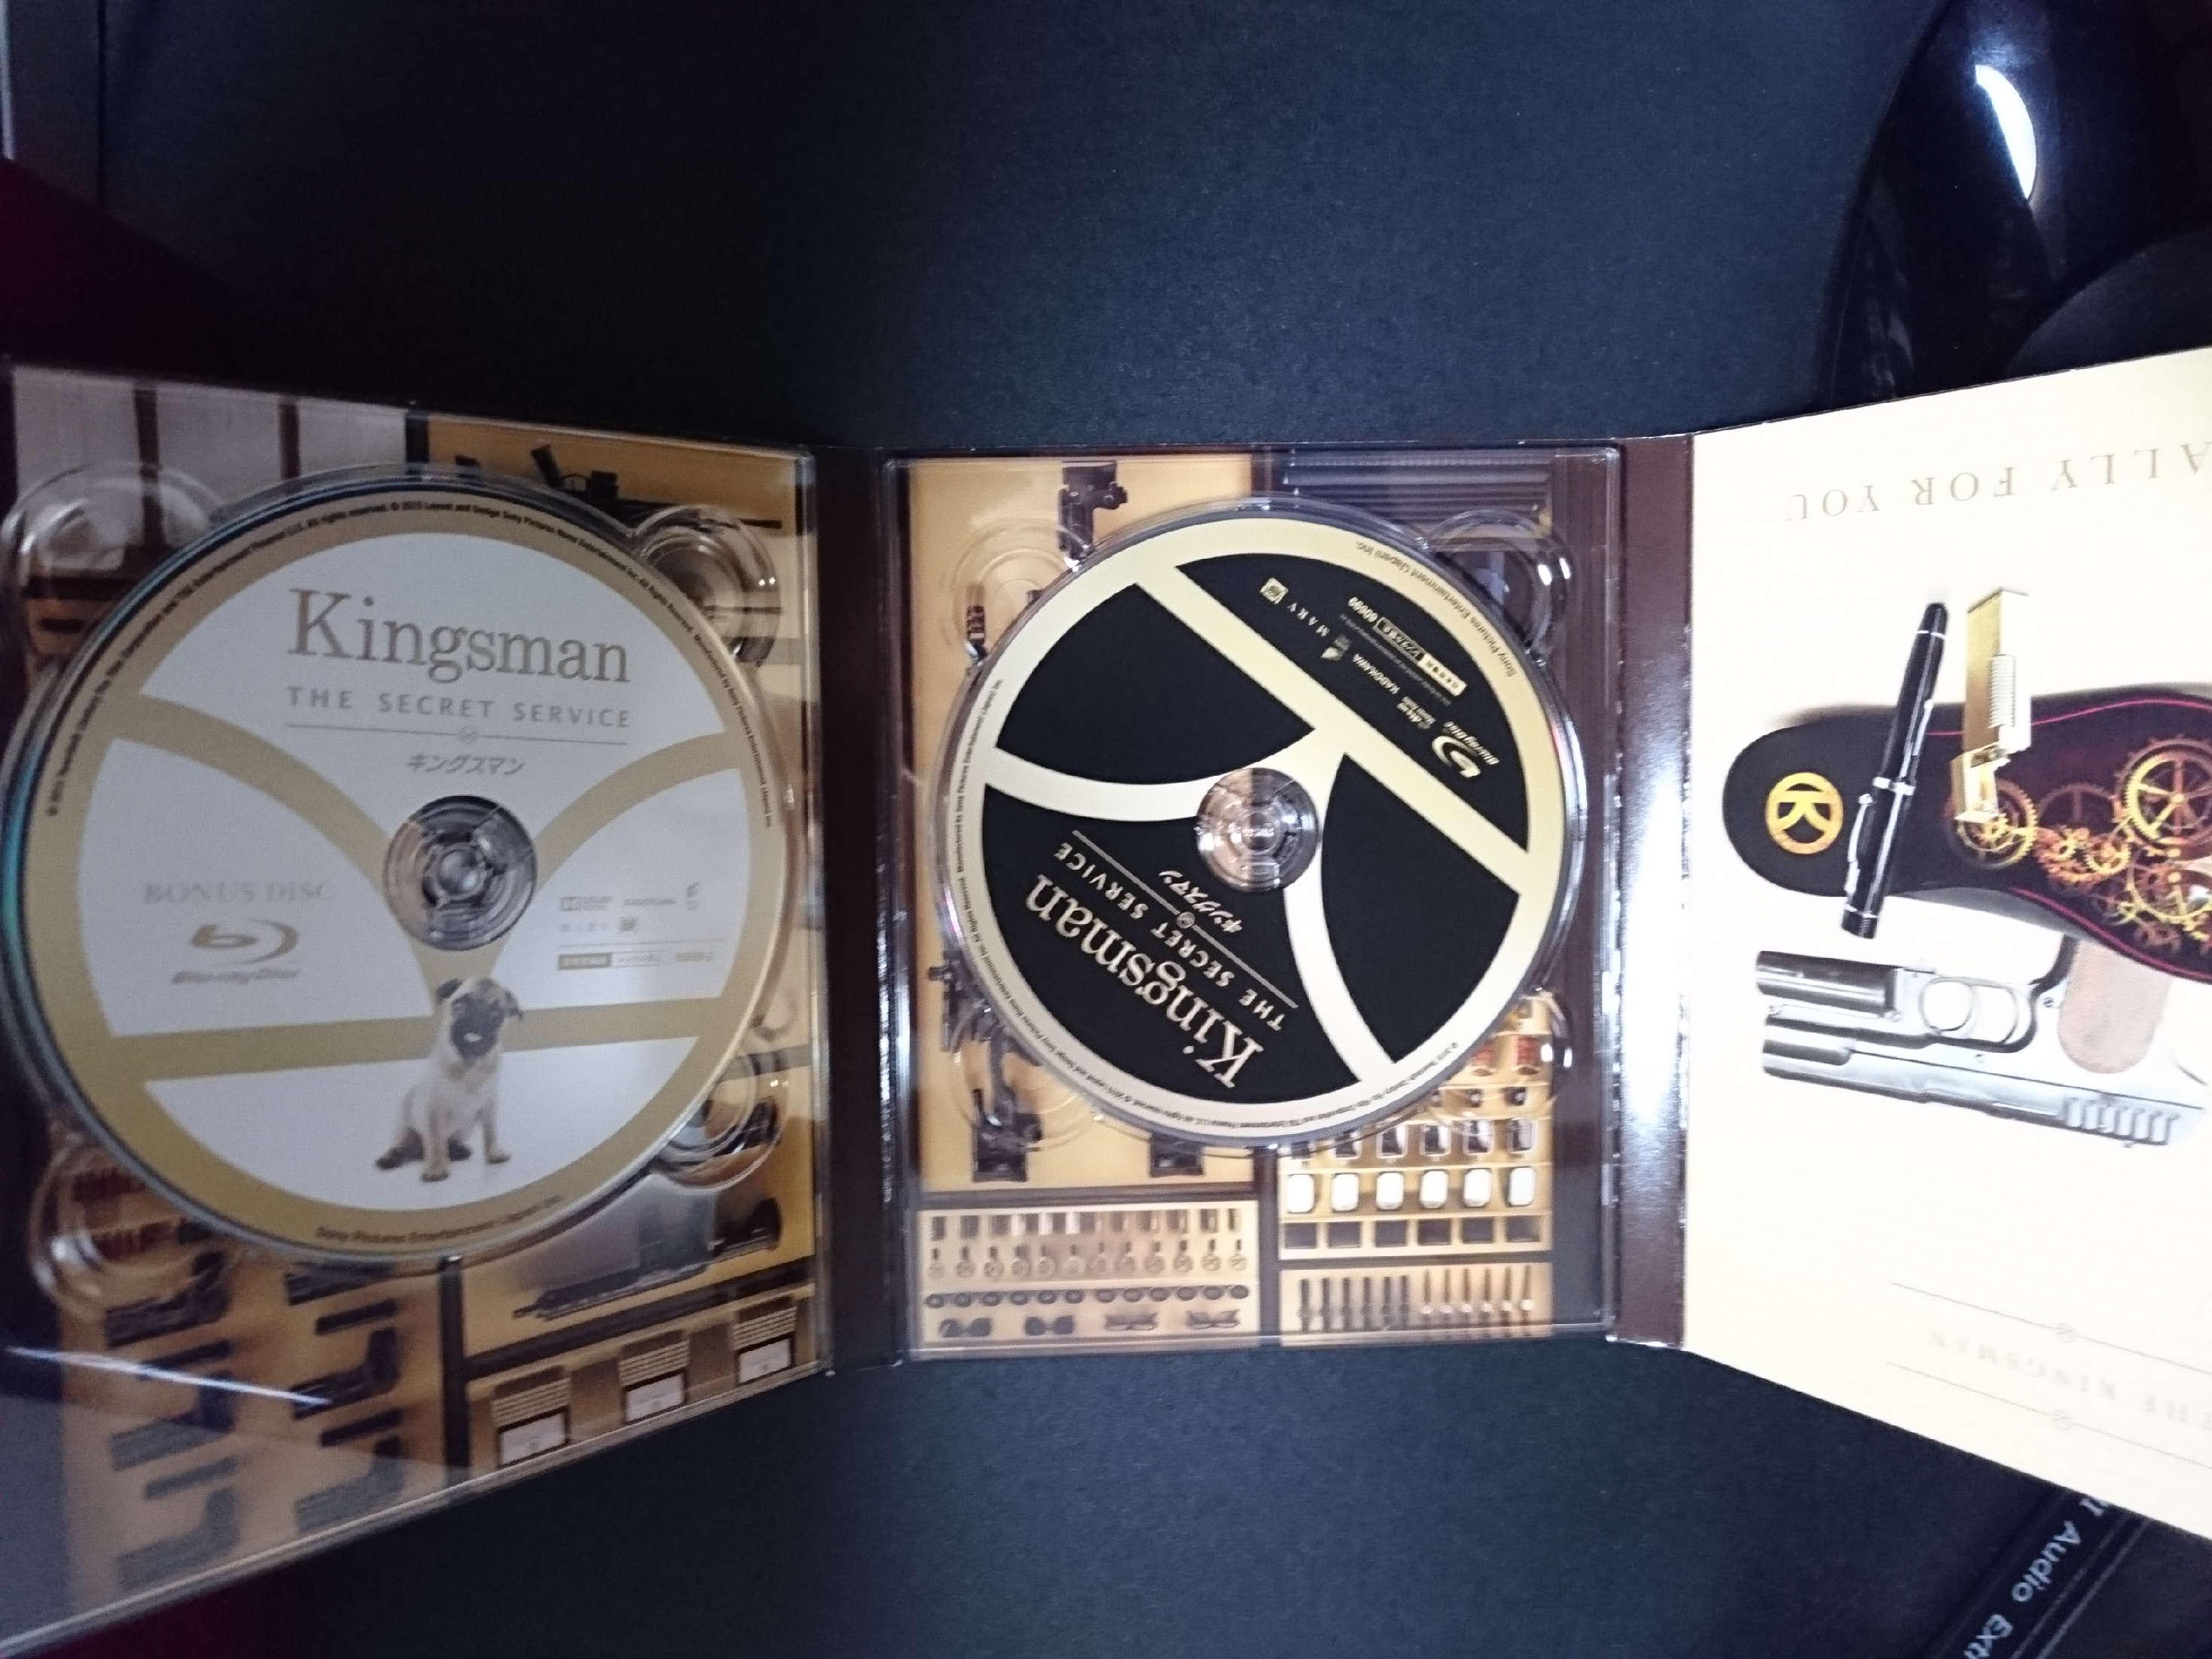 Kingsman4.jpg